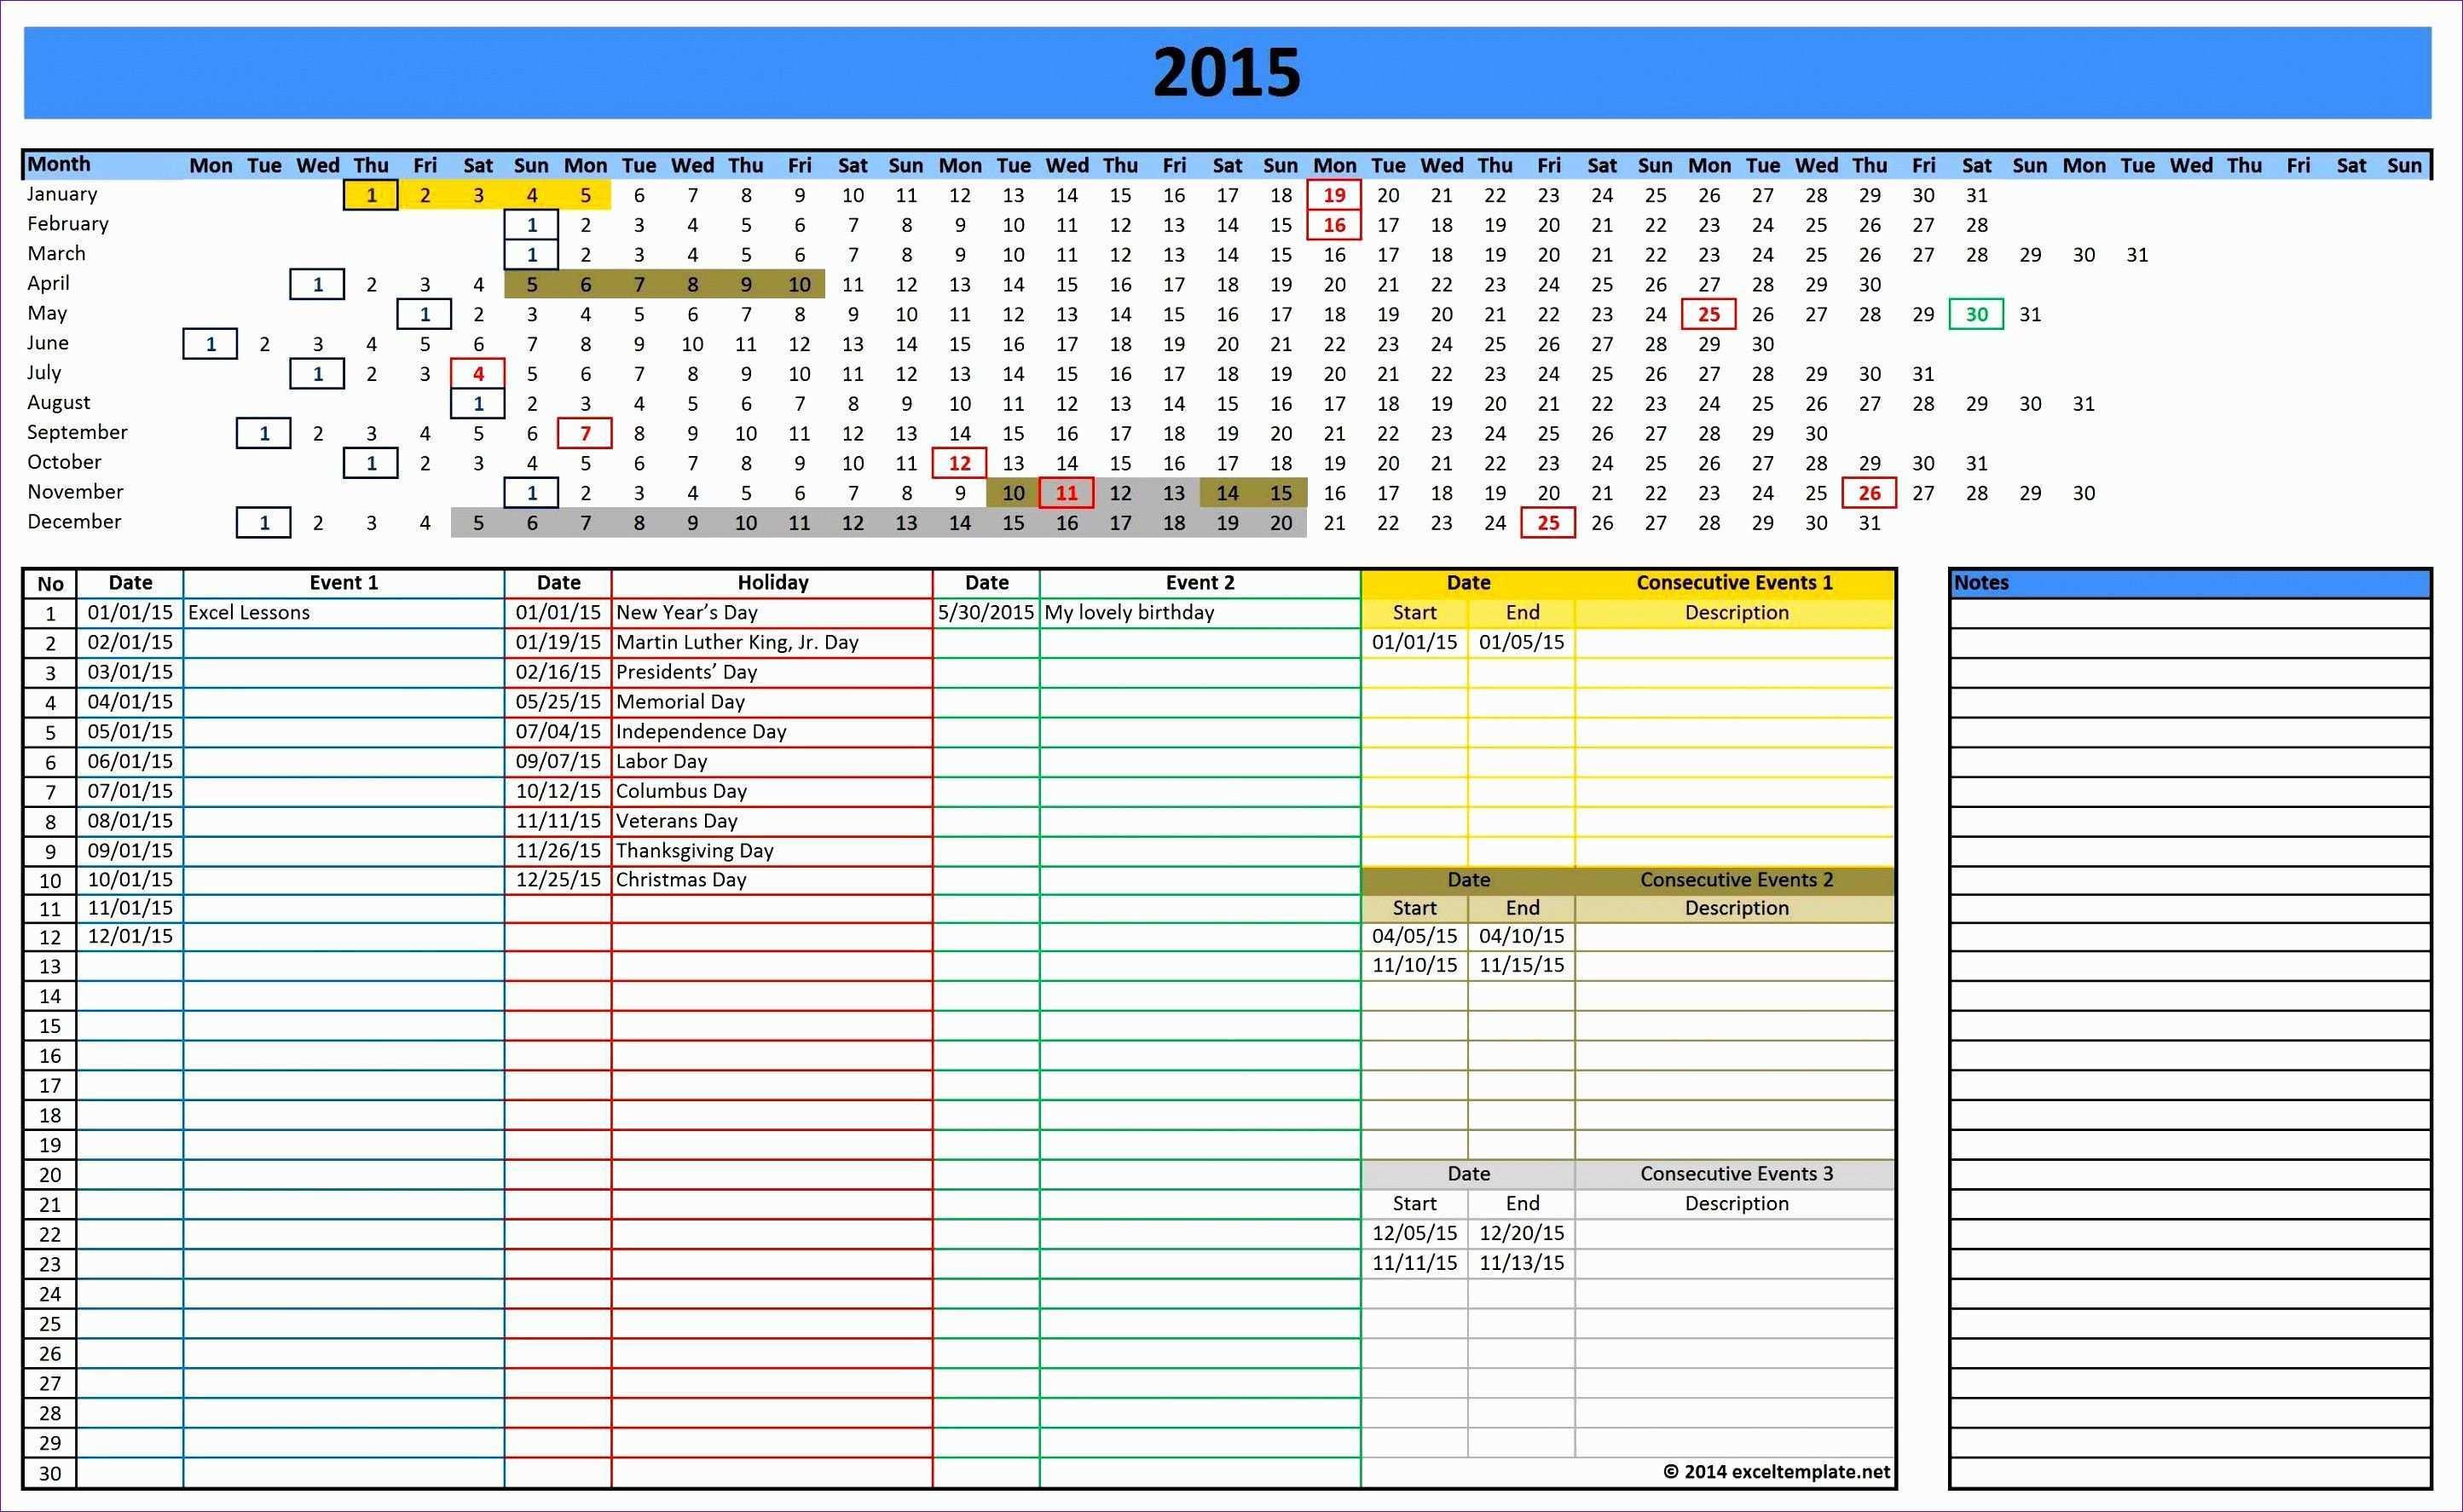 Workforce Plan Template Excel Inspirational 6 Workforce Planning Template Excel Exceltemplates Excel Calendar Template Excel Calendar Excel Templates